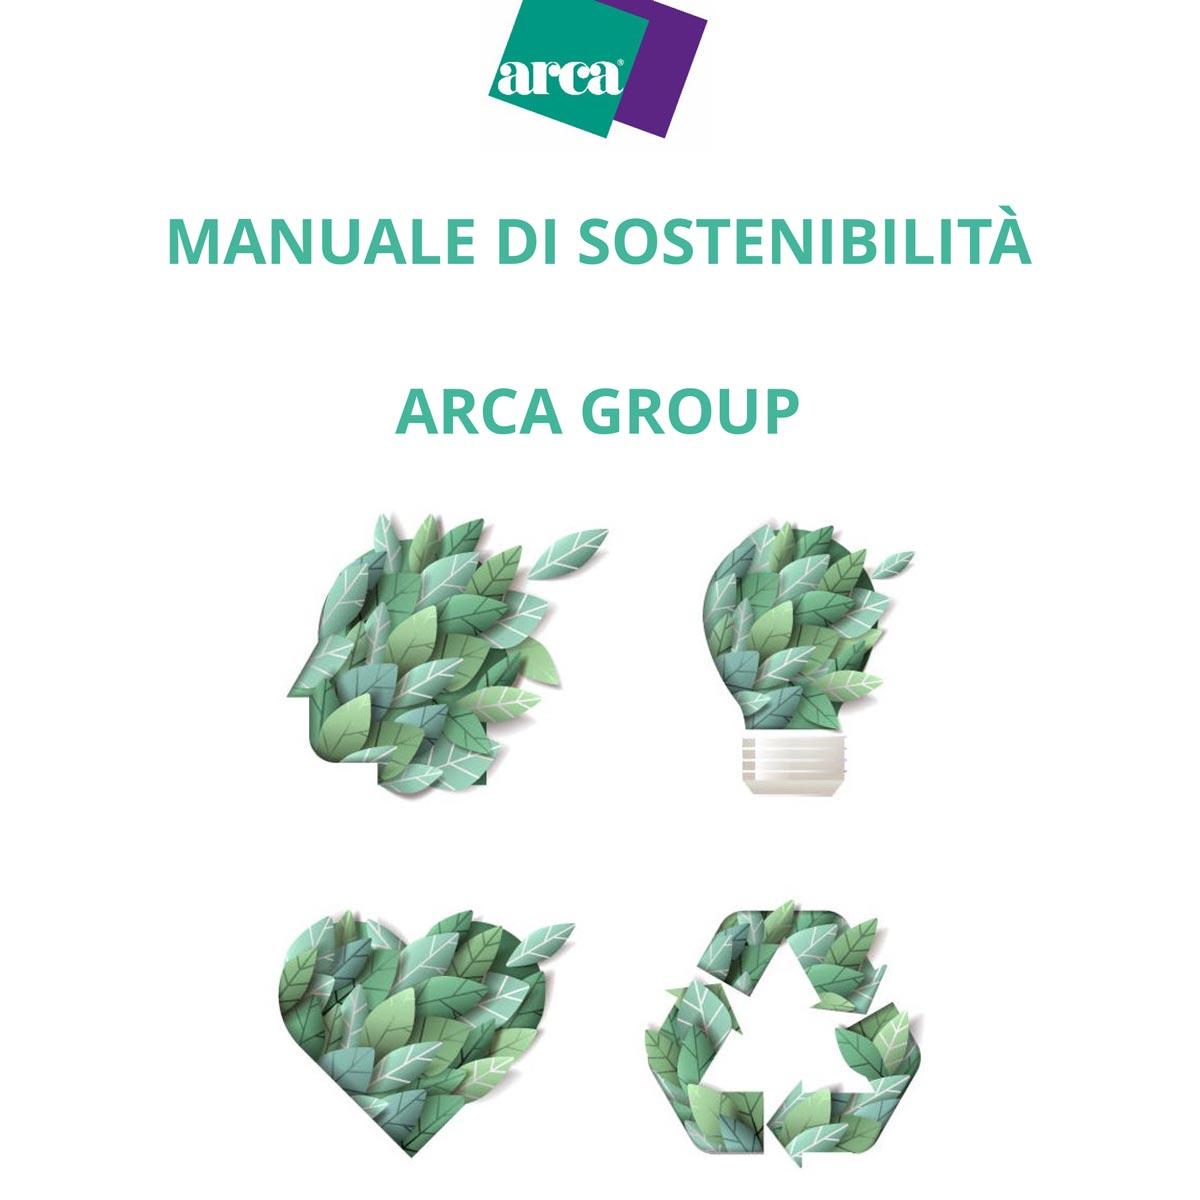 arca-group-etichette-etichettatura-labeling-100